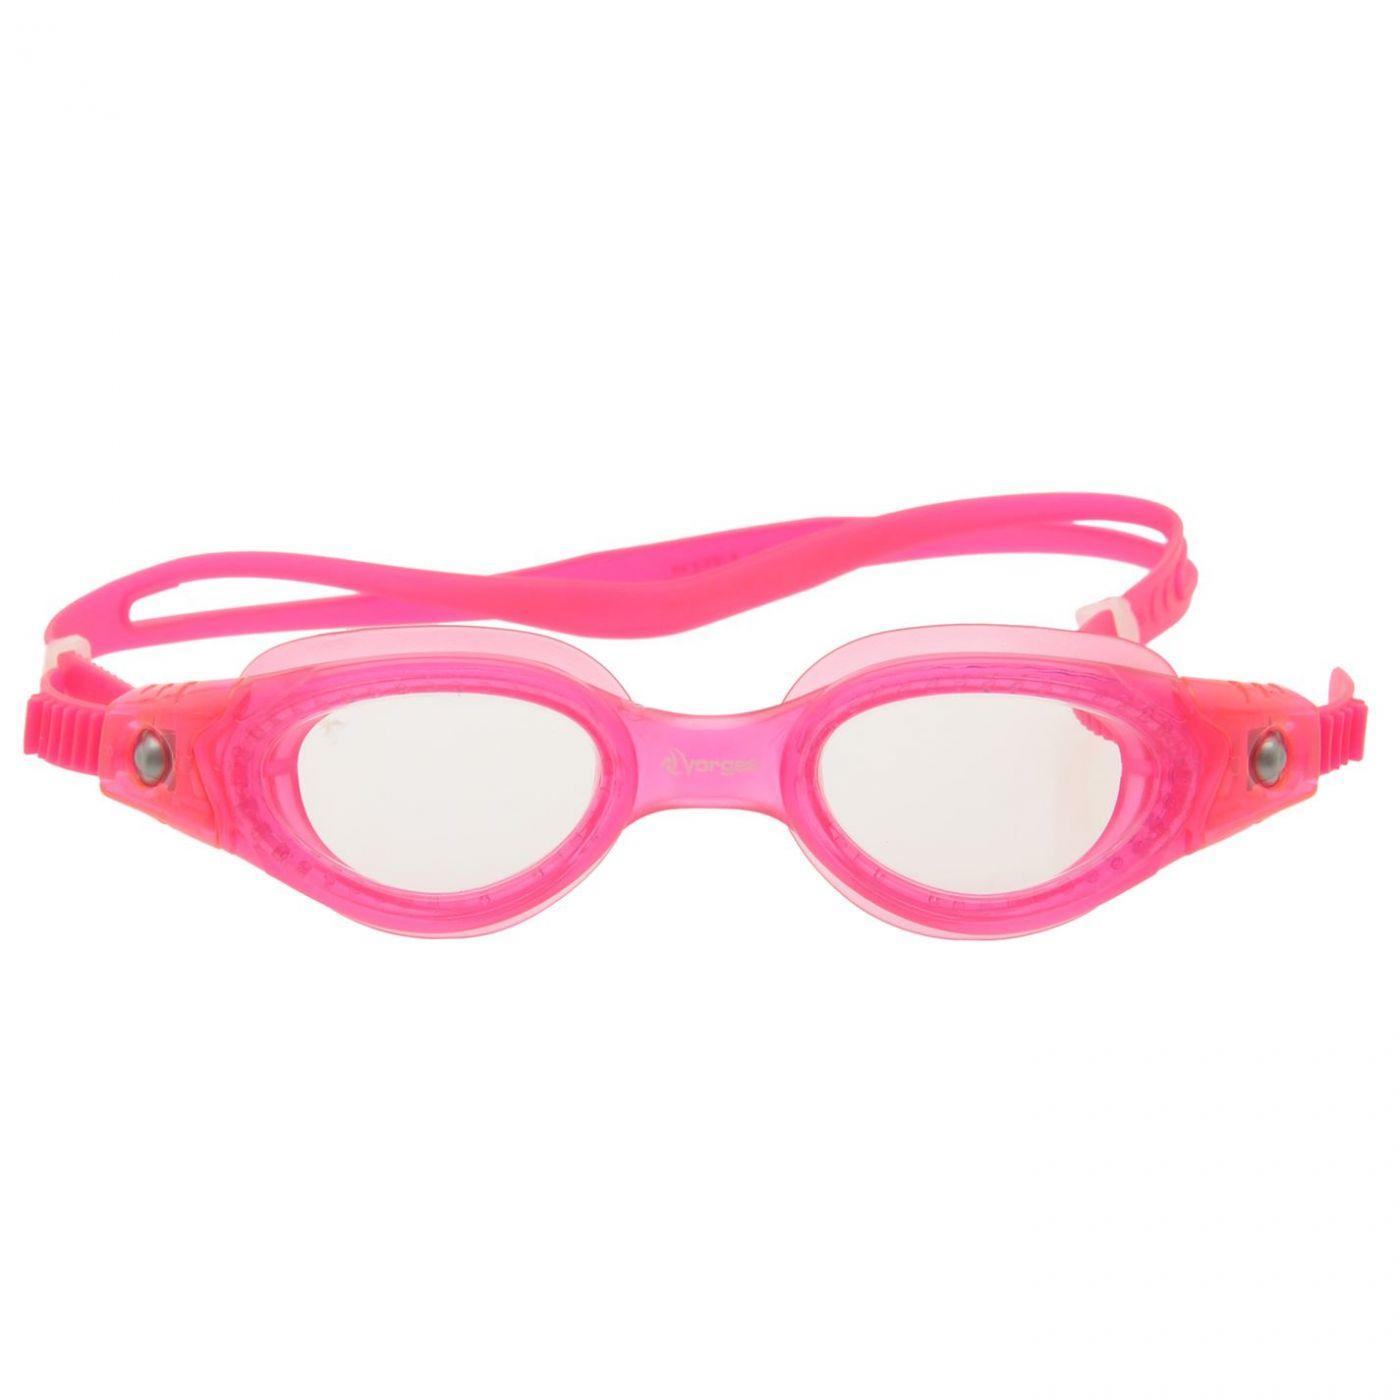 Vorgee Vortech Junior Swimming Goggles